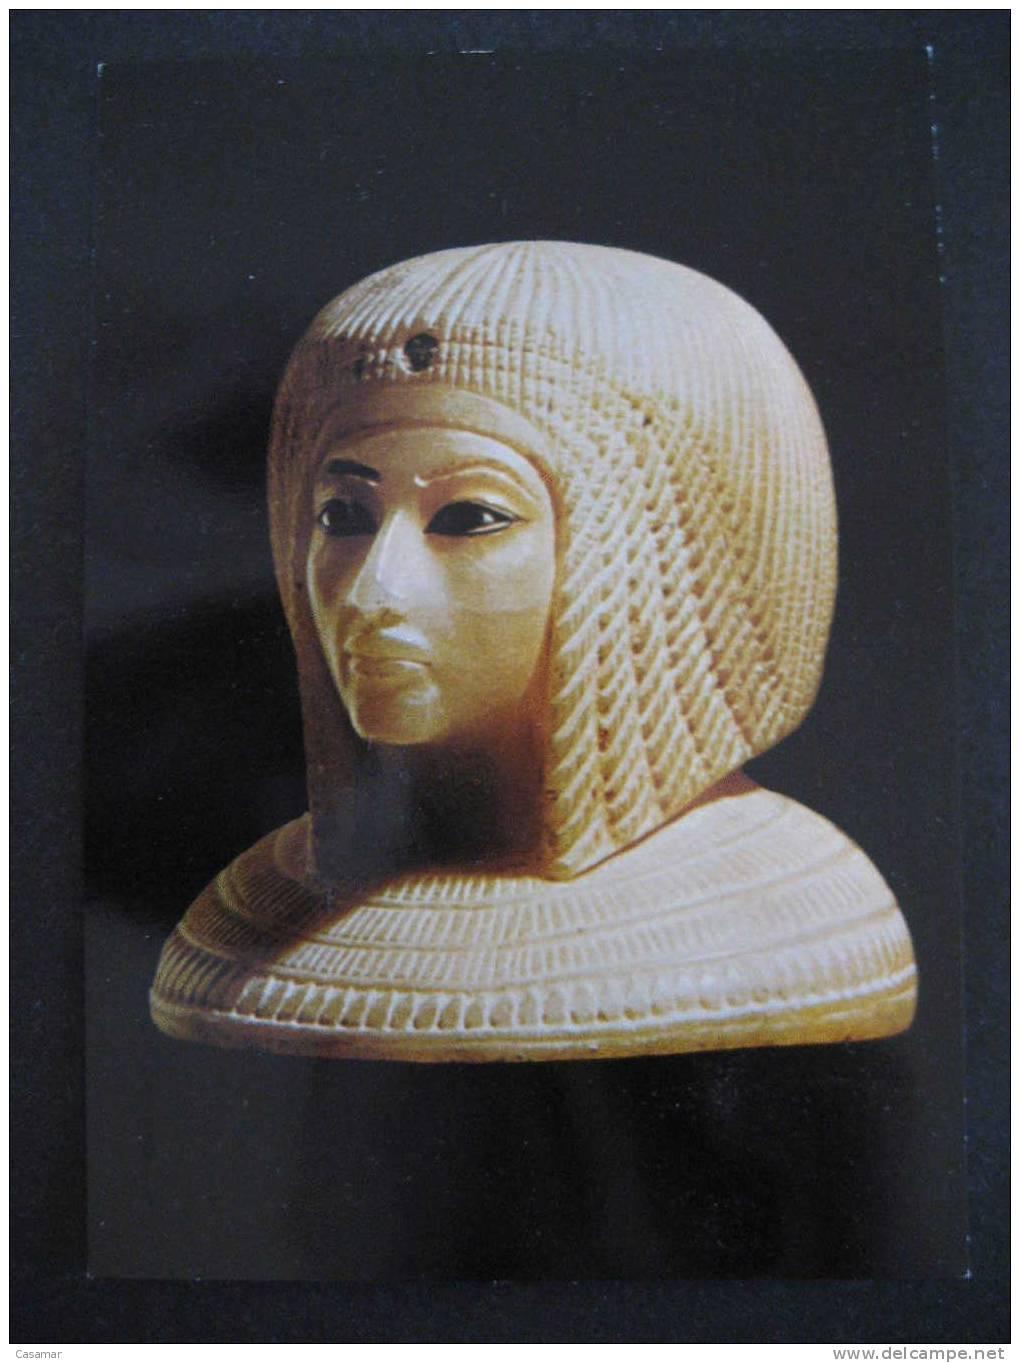 AUSTRIA Egypt Egypte Theben Royal Family Archeology Archeologie Prehistory Prehistoire Art Arqueologia Prehistoria - Historia